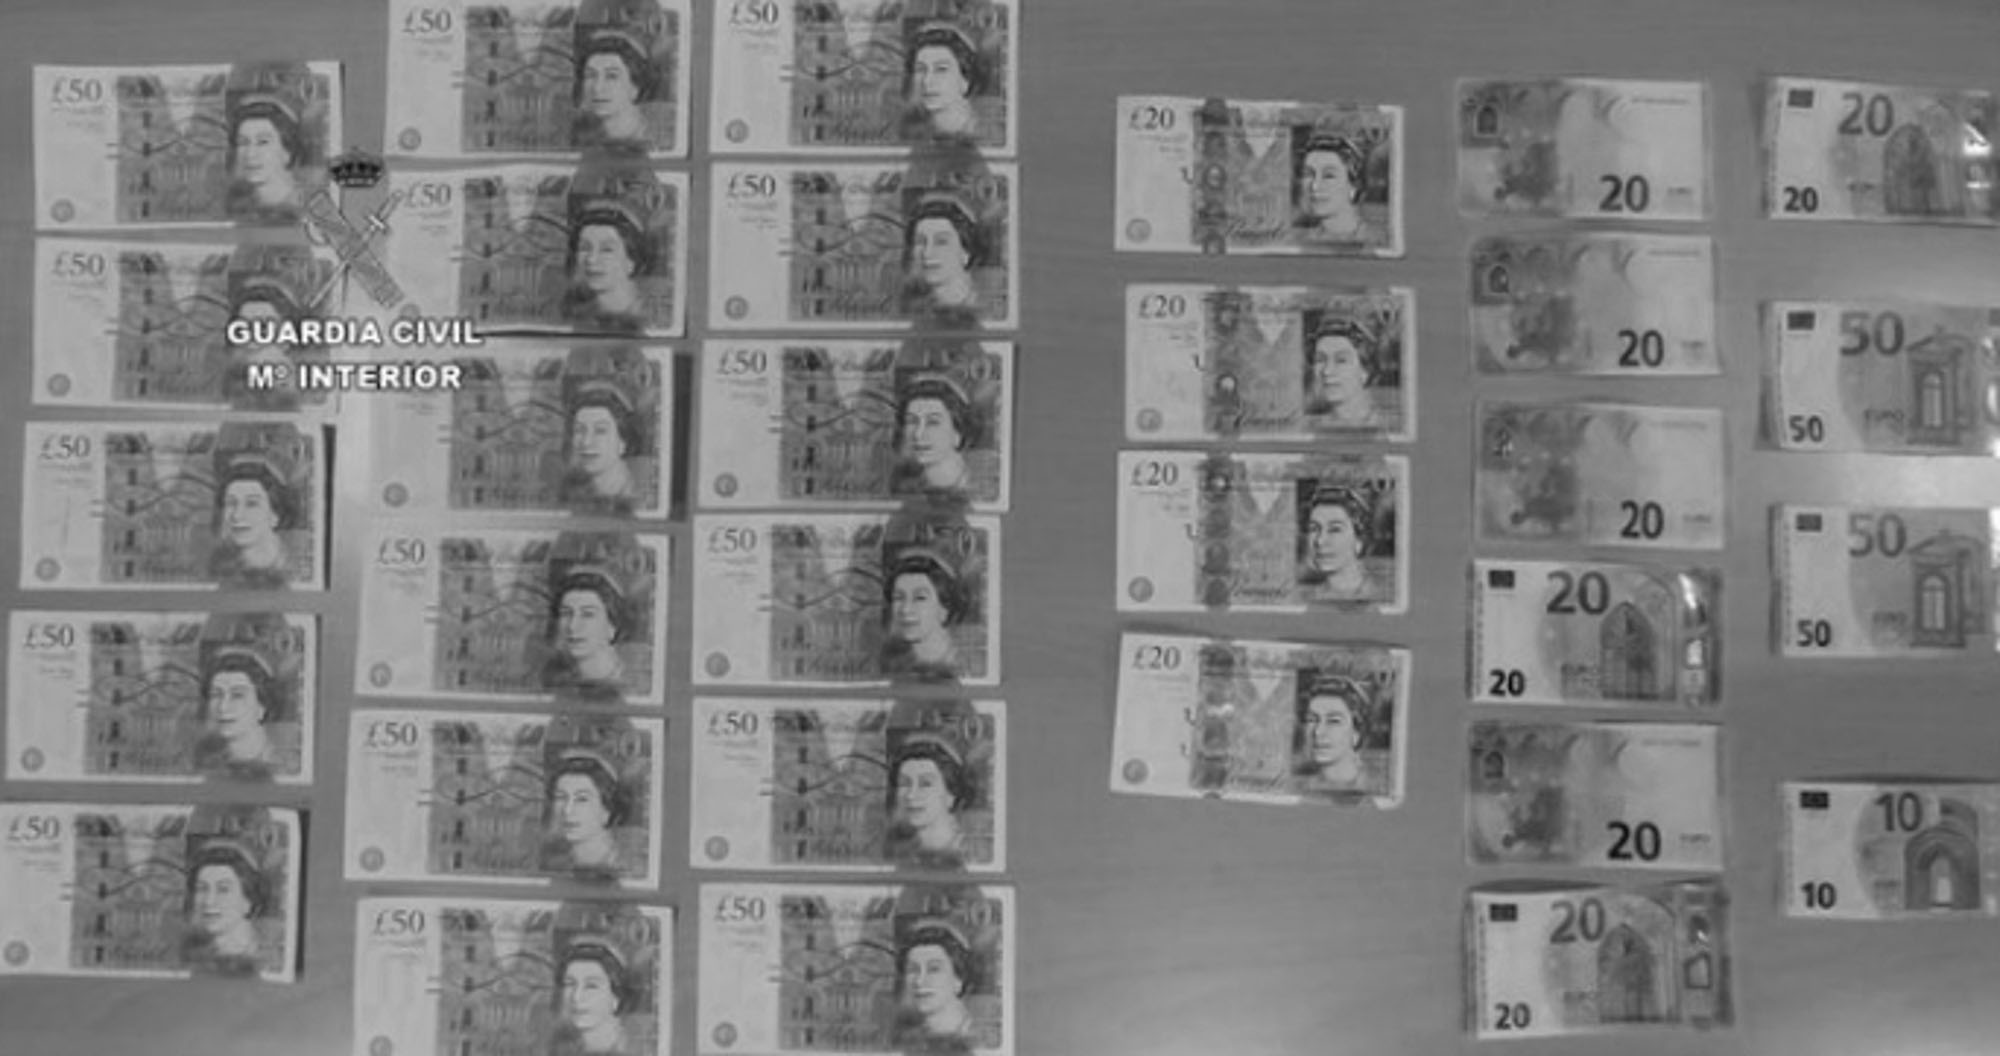 Brit Family Arrested For Splashing Fake Cash In Majorca